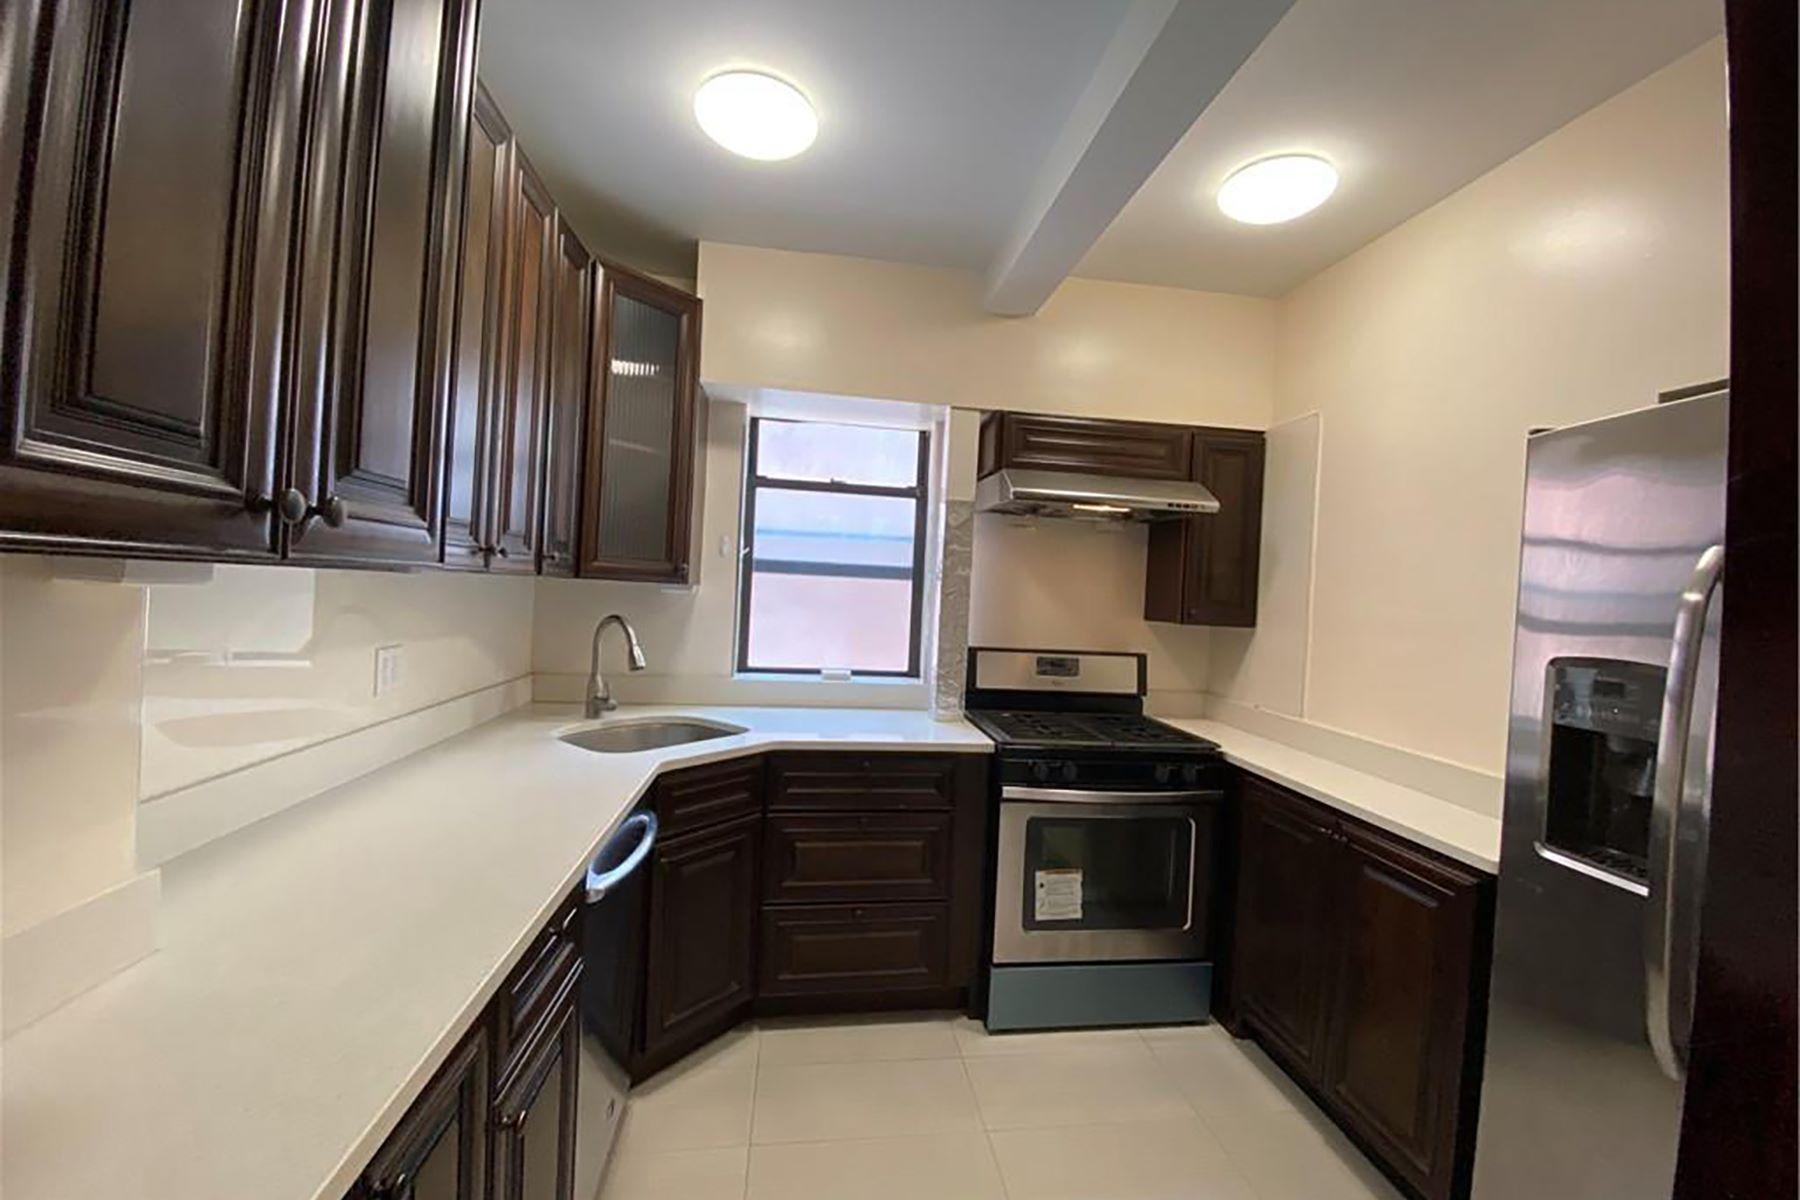 Co-op Properties 為 出售 在 Beautiful Newly Renovated 1 Bedroom CoOp 11 Columbia Avenue, B1, Hartsdale, 纽约 10530 美國